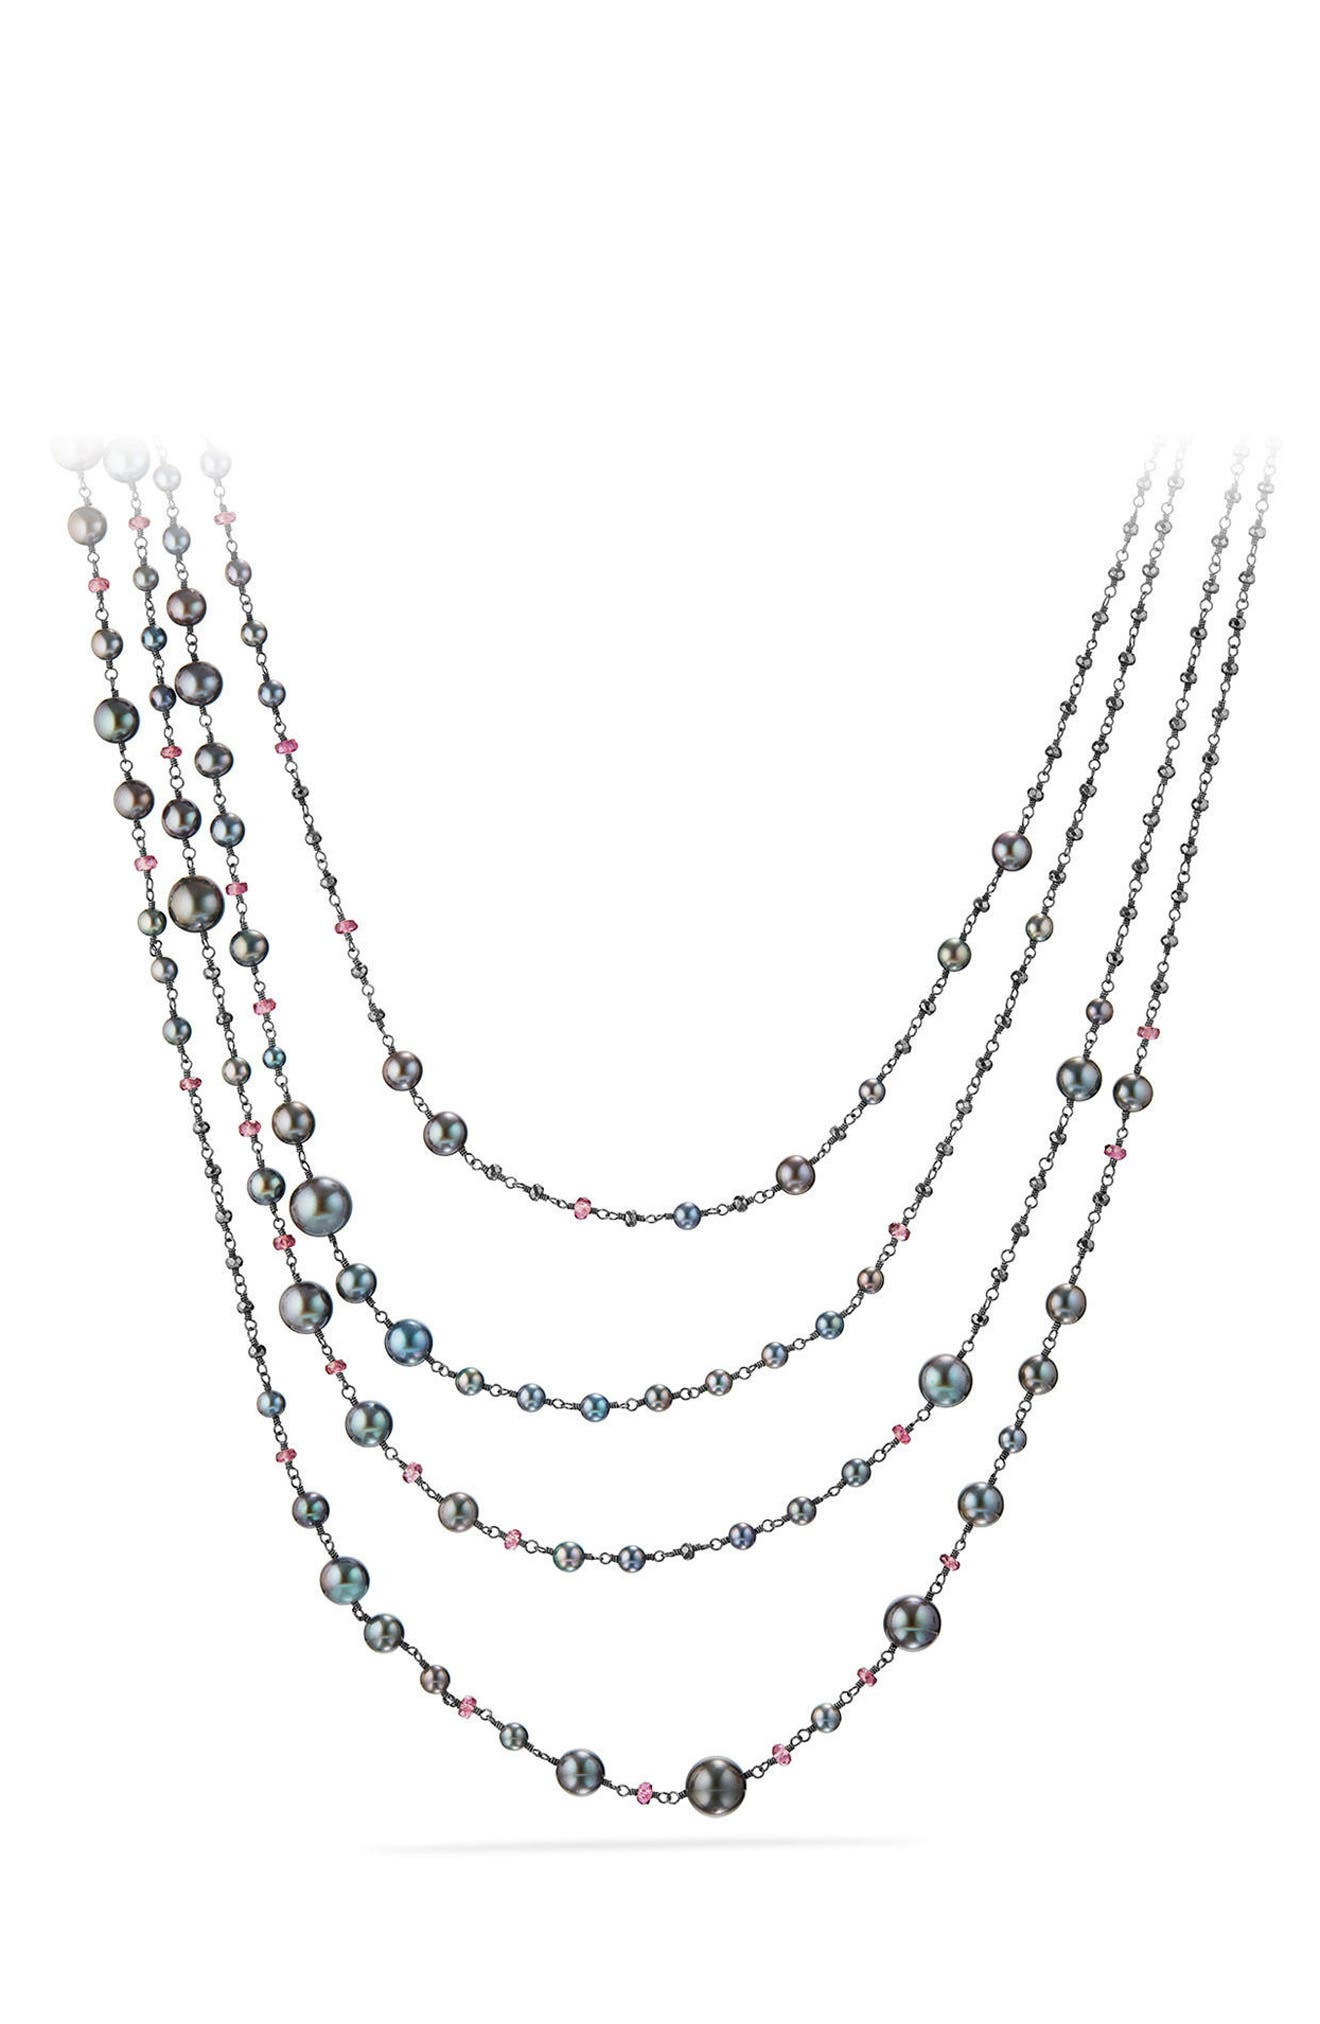 David Yurman Solari Pearl & Bead Multistrand Necklace